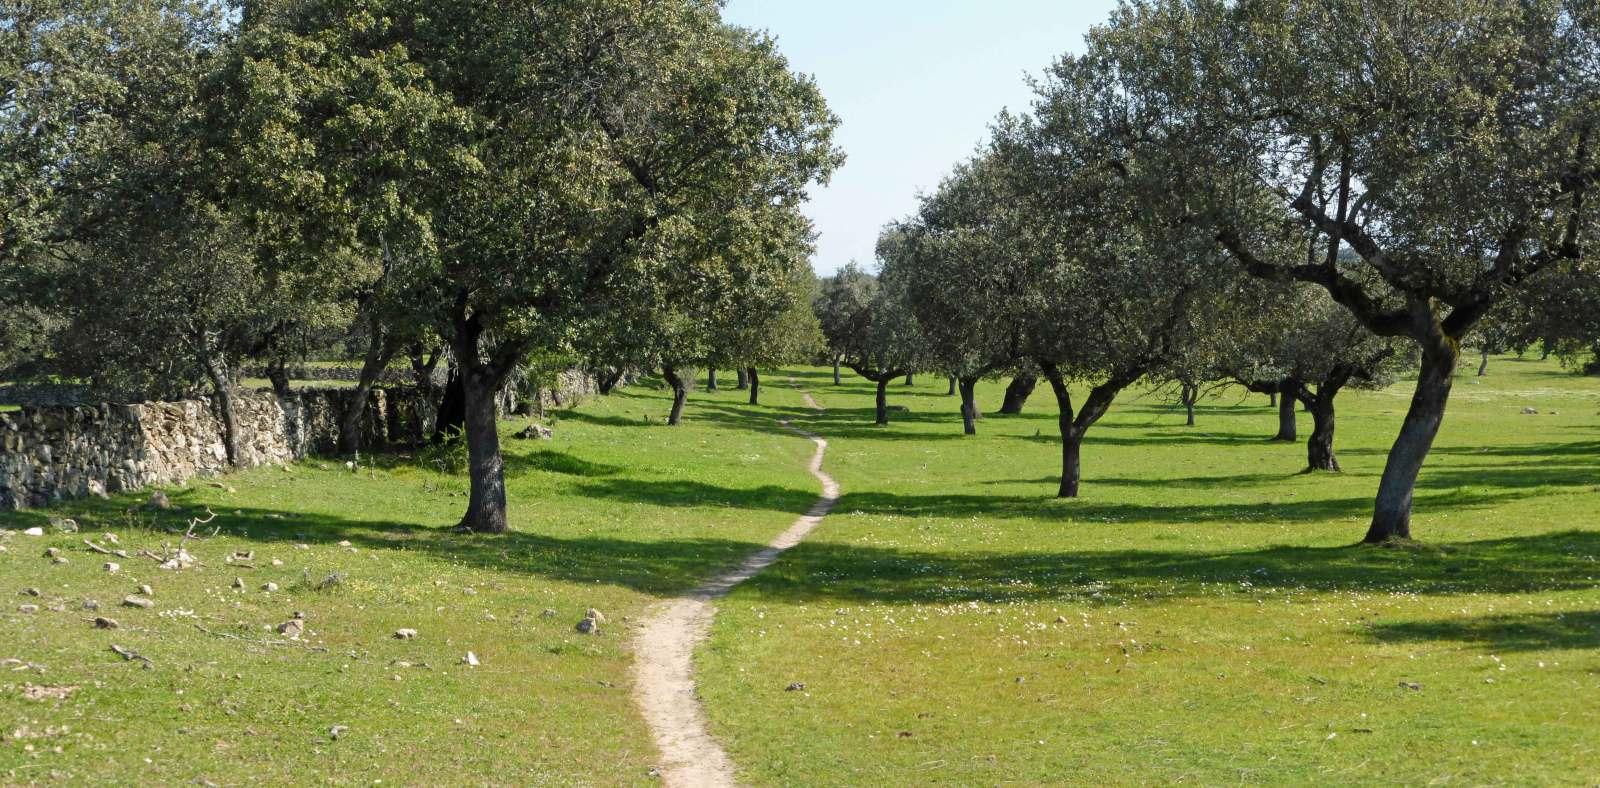 Vía de la Plata-Camino Sanabrés (Sevilla-Santiago). W9u3kl